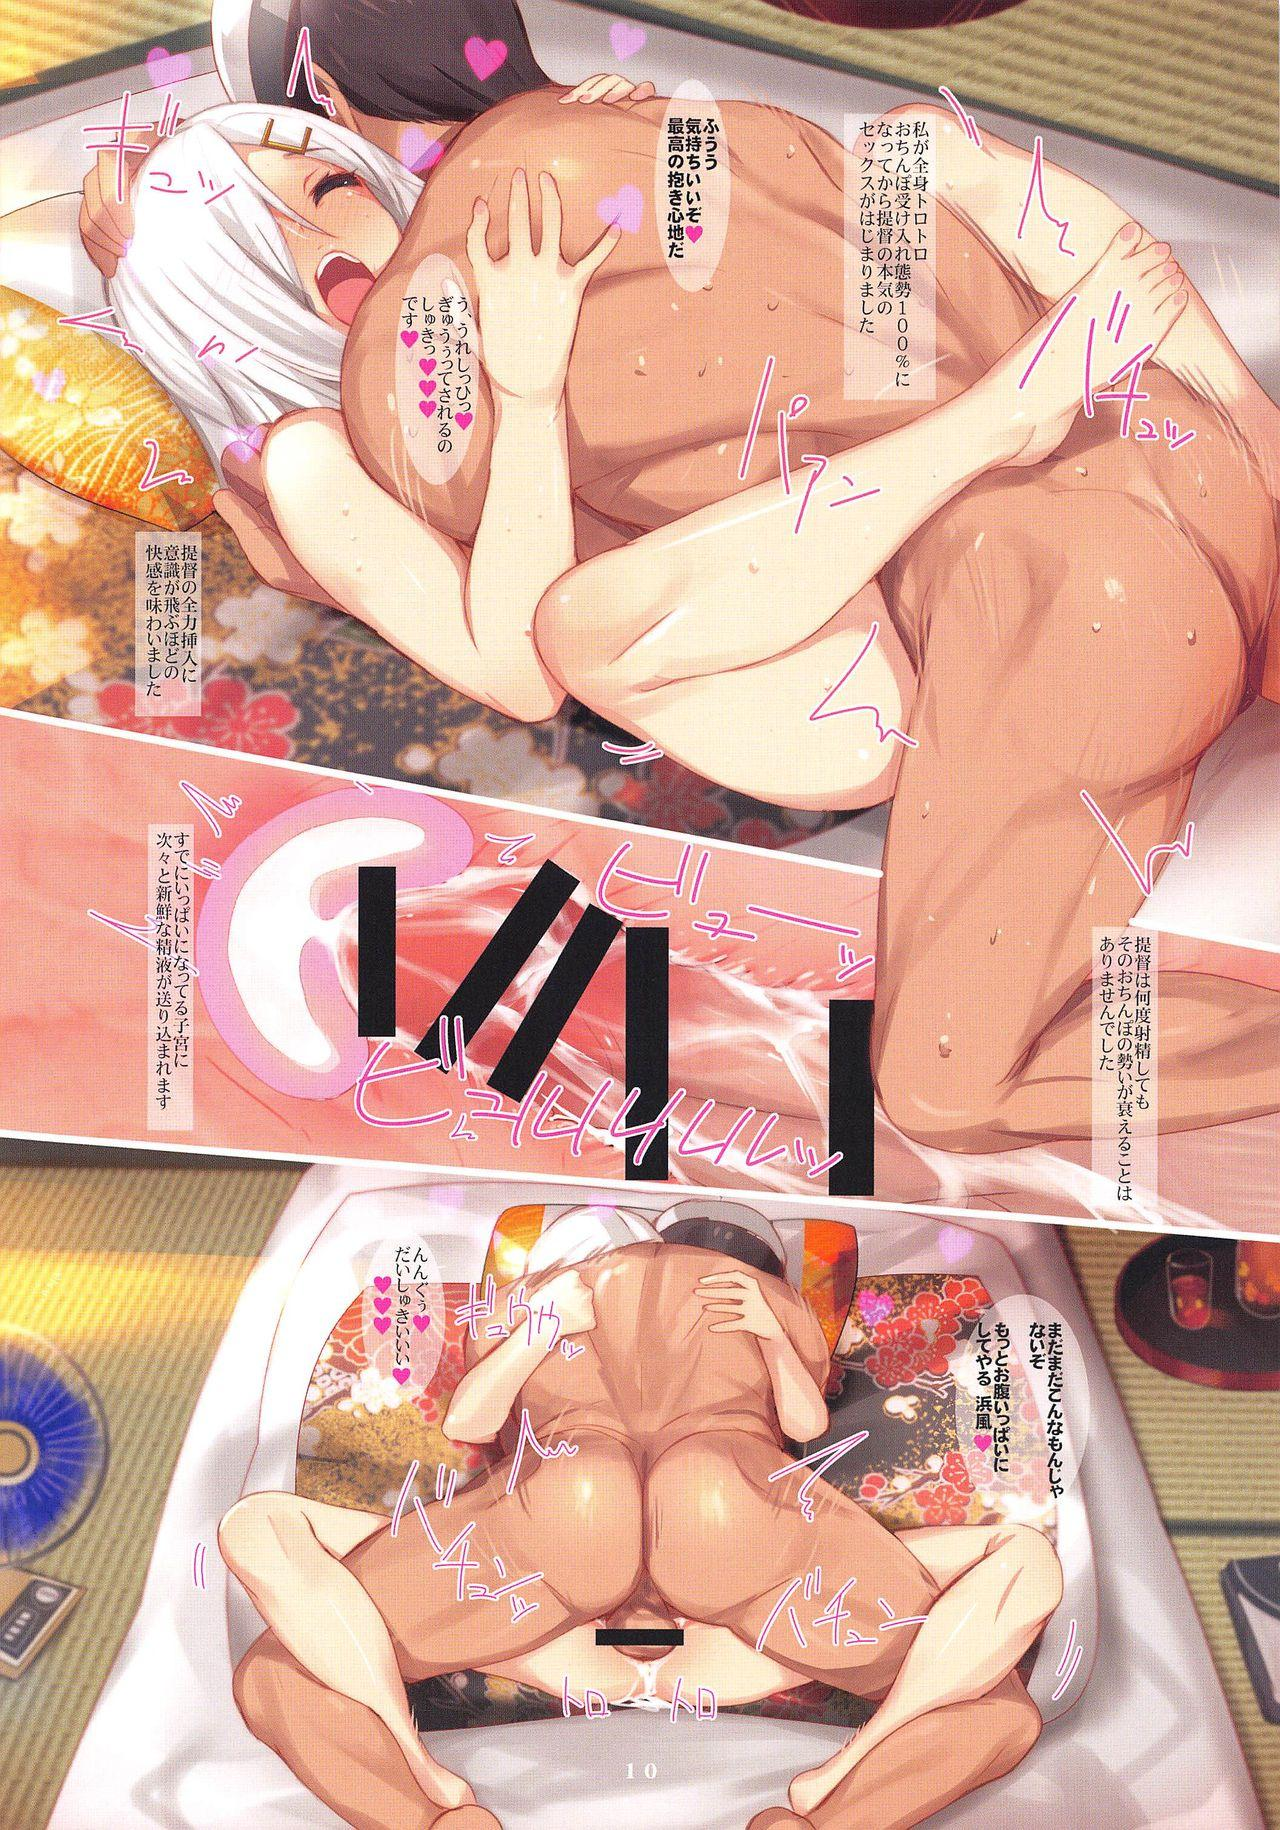 Hamakaze to 24-jikan Dokodemo SEX 9